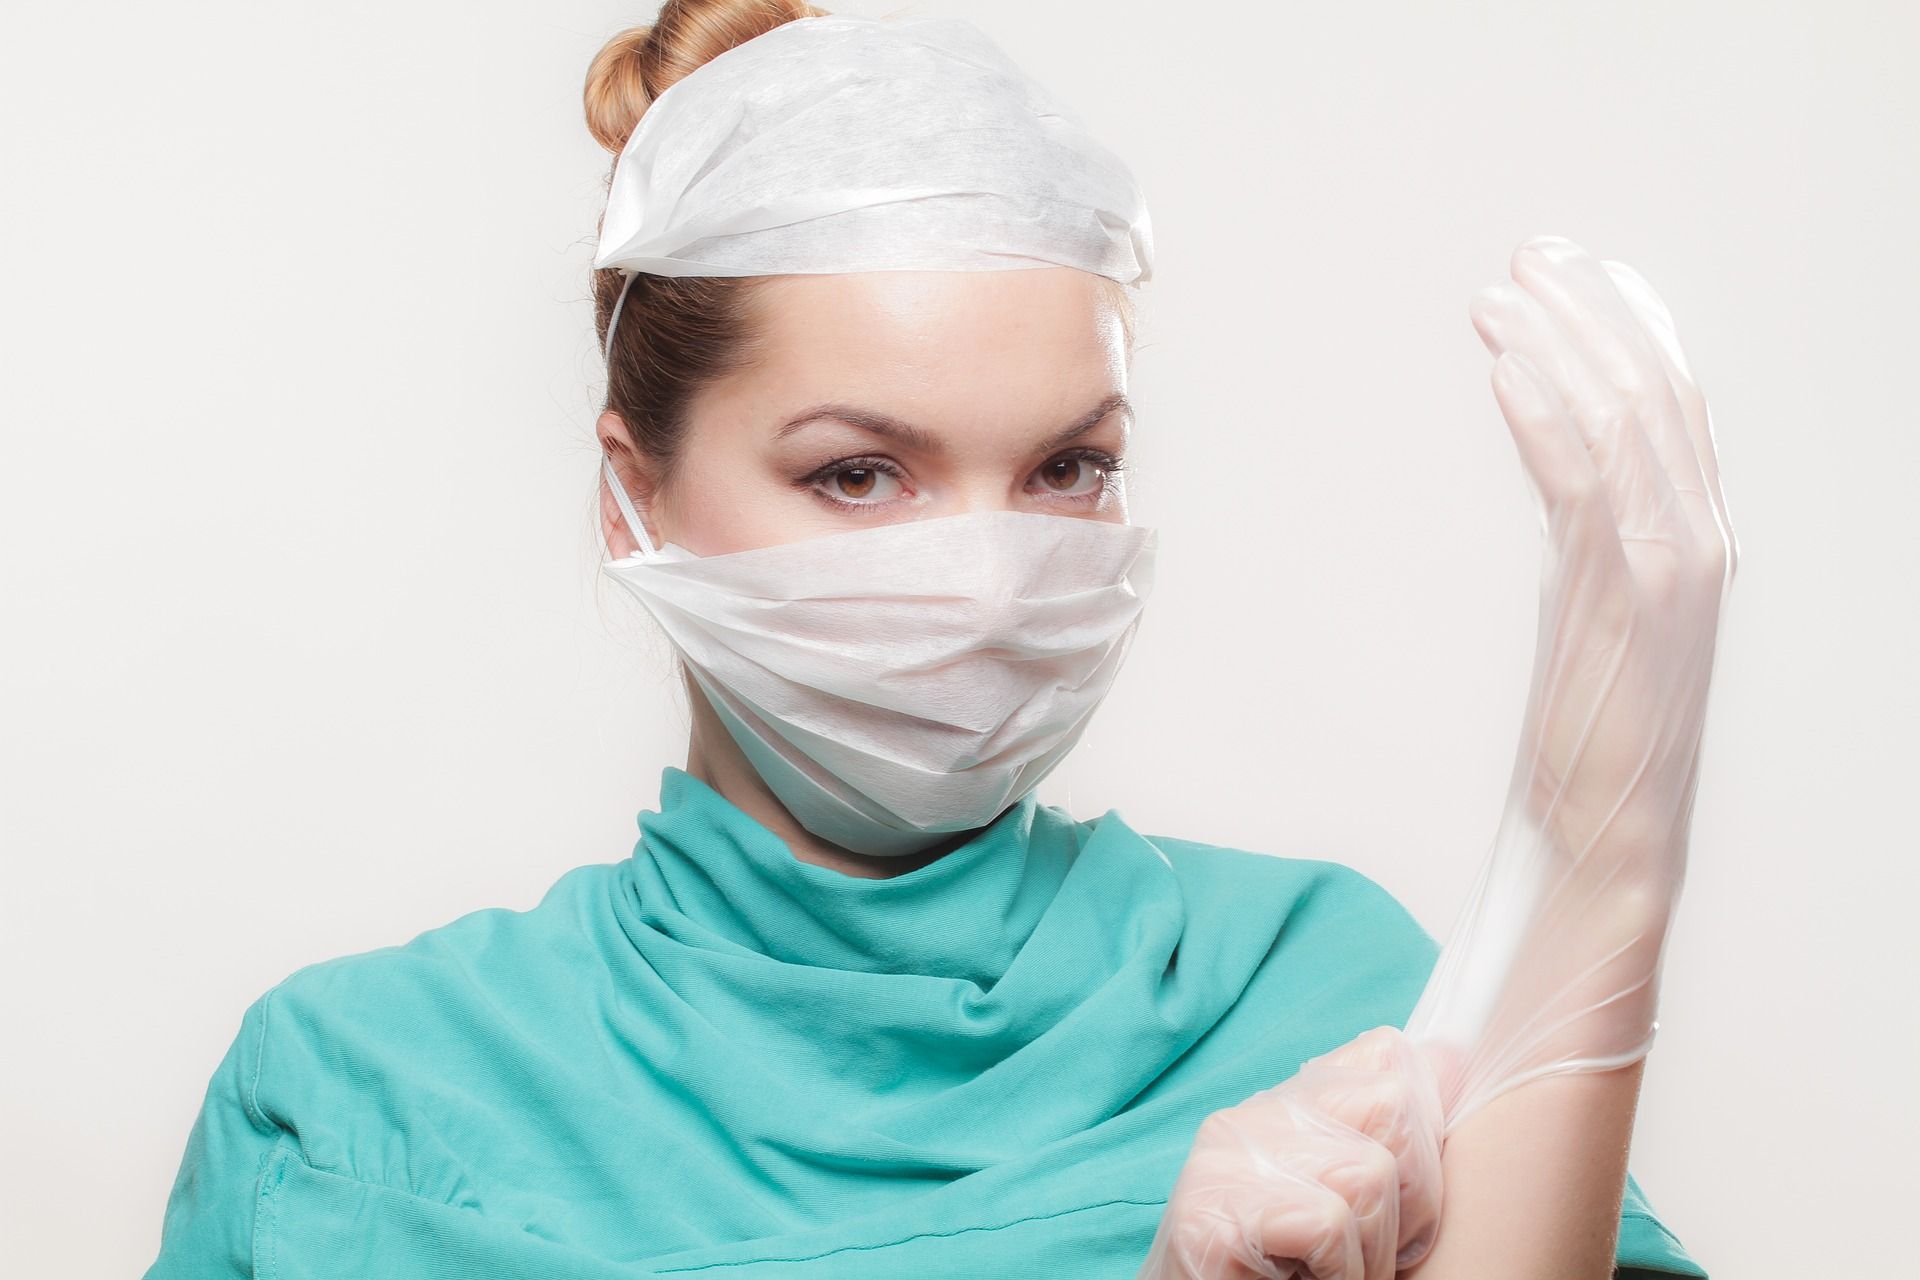 dezinfectie-la-superlativ-produse-marca-laboratoires-anios-disponibile-in-magazinul-medizone